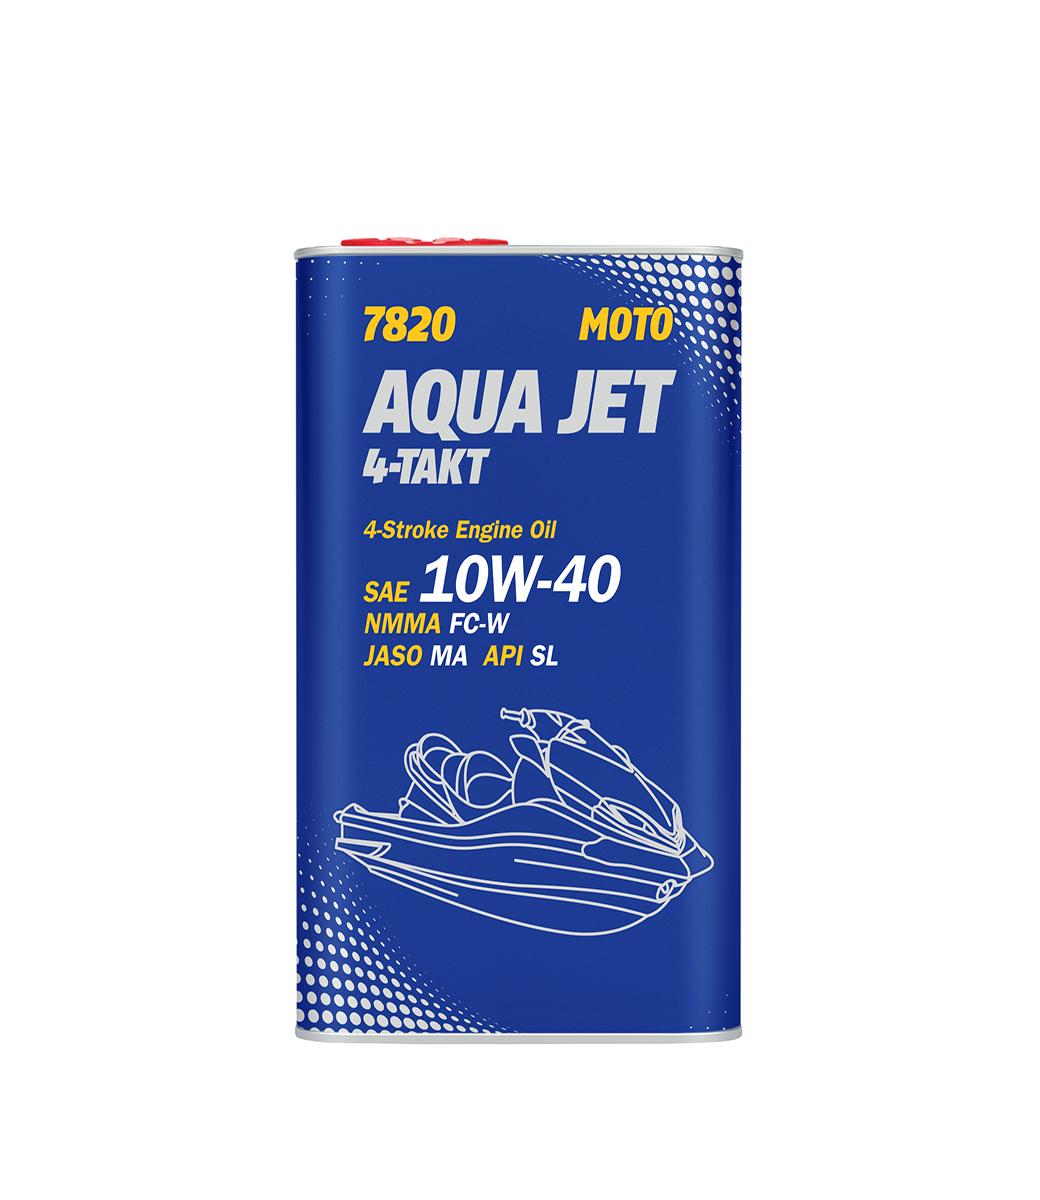 Aqua Jet 4-Takt 10w-40